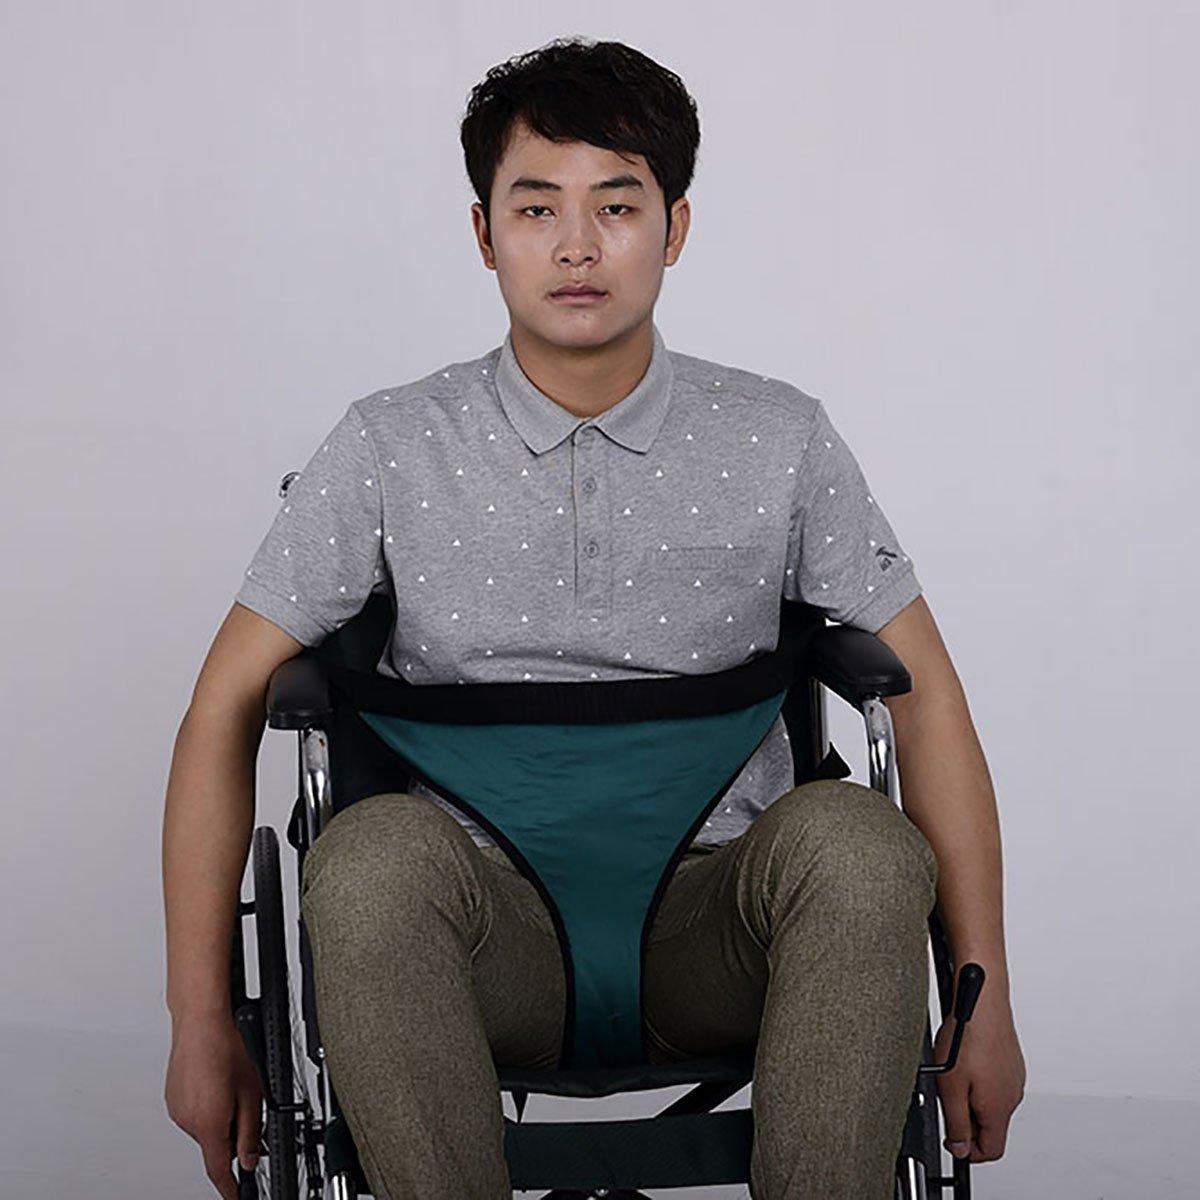 Chenhon Soft Cushion Belt, for Wheelchair or Bed (Green)